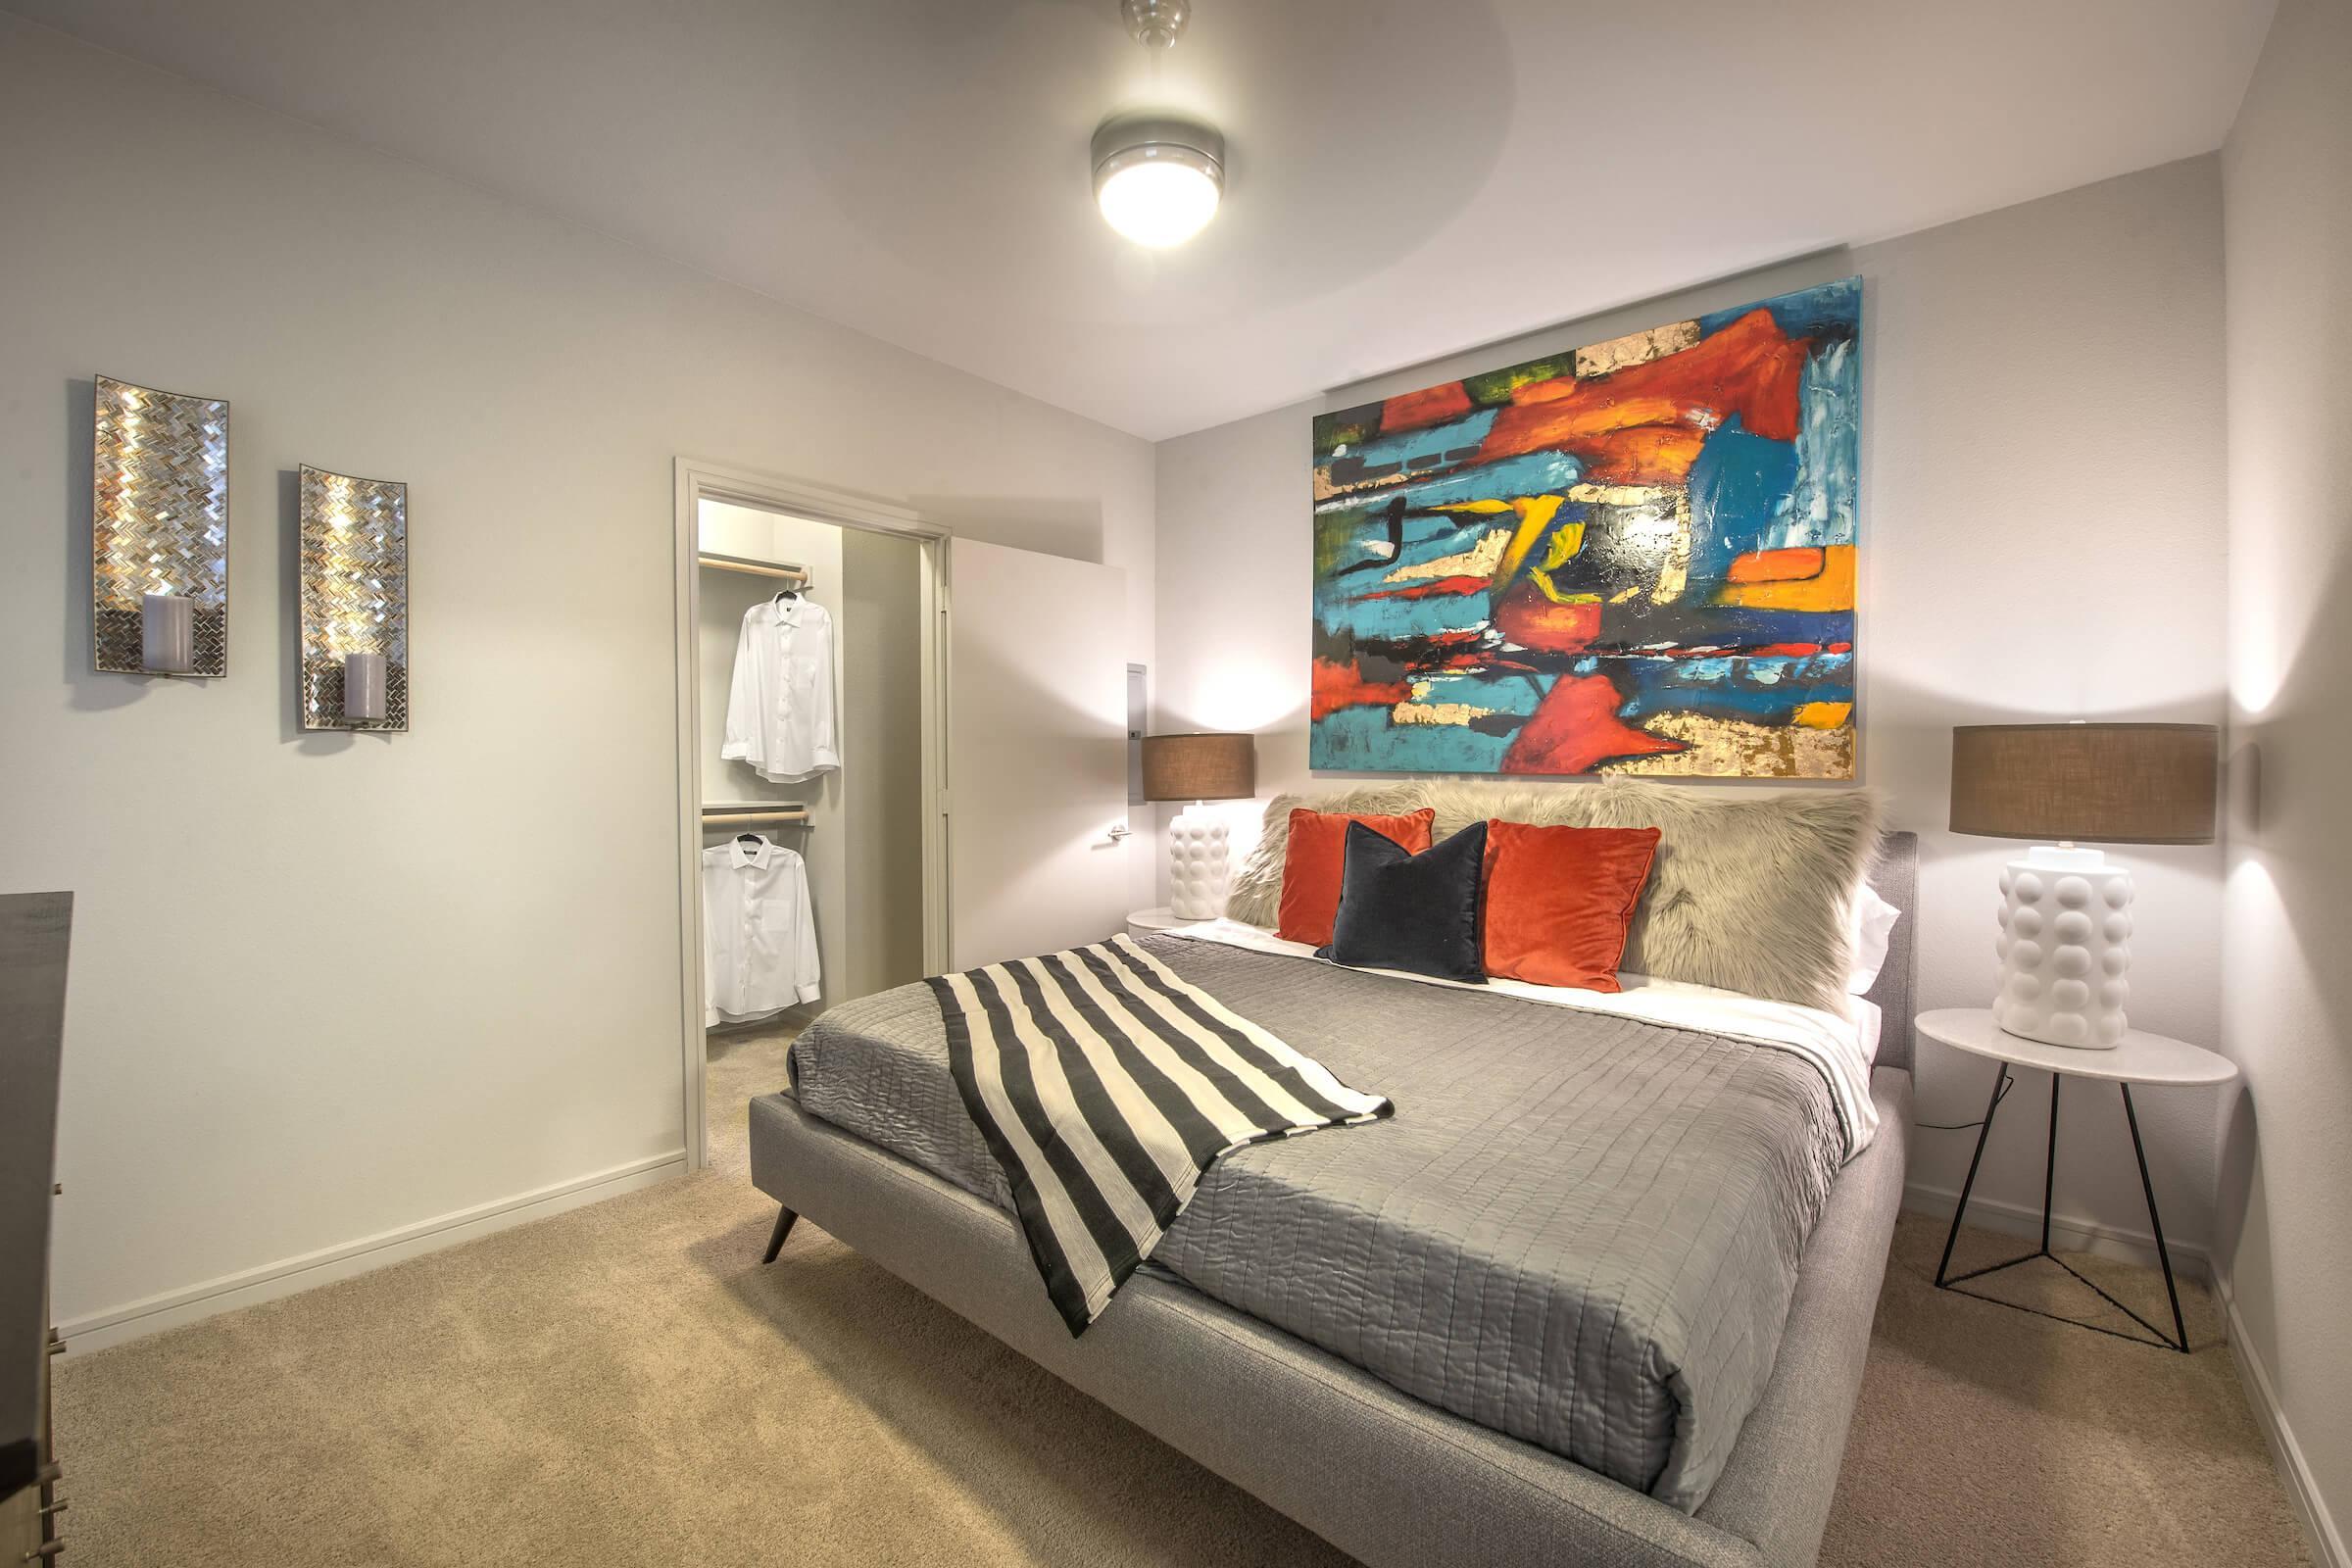 YOUR NEW BEDROOM